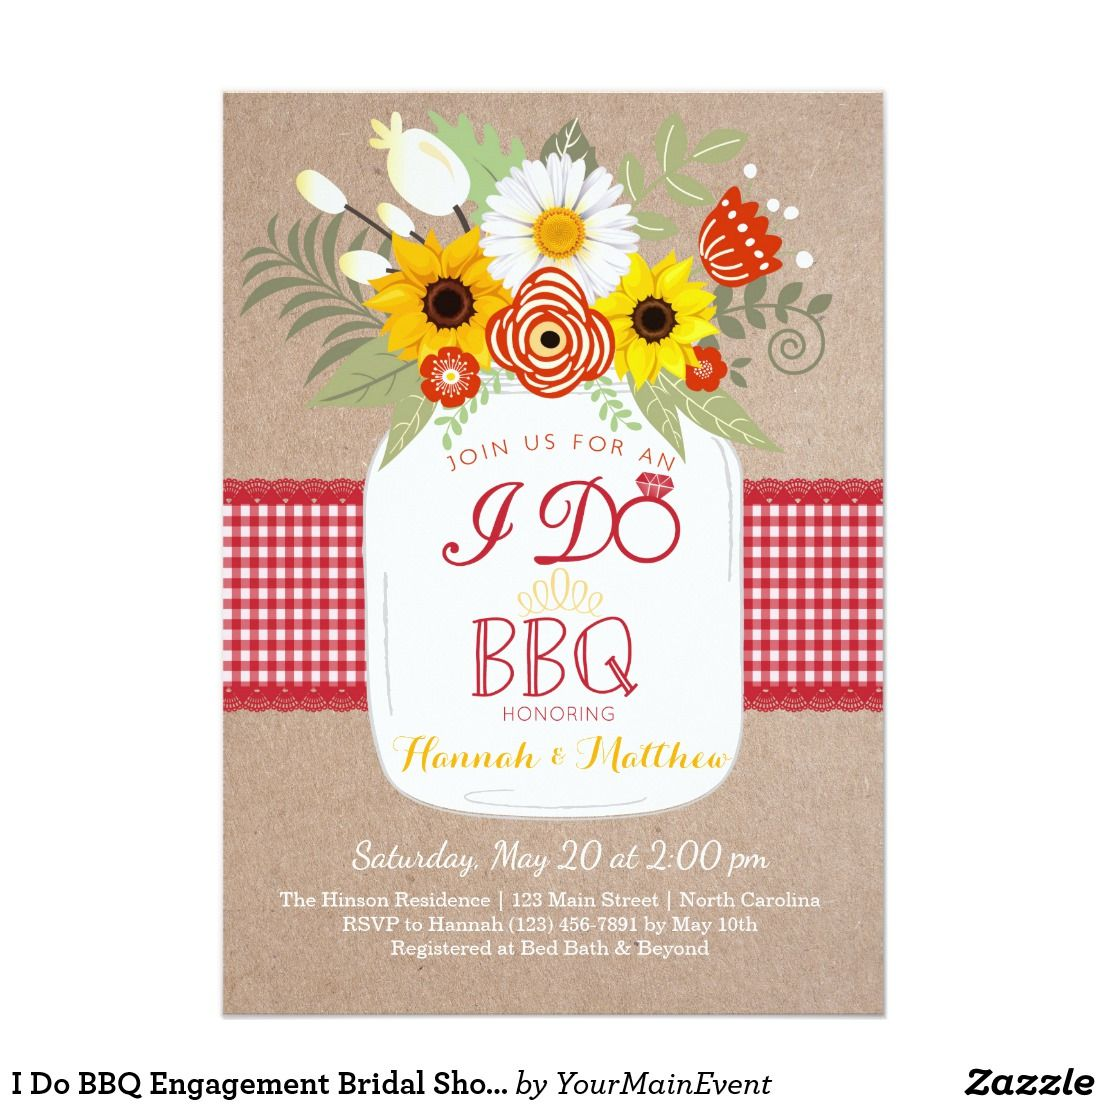 I Do BBQ Engagement Bridal Shower Invitation. | Mason Jar Wedding ...